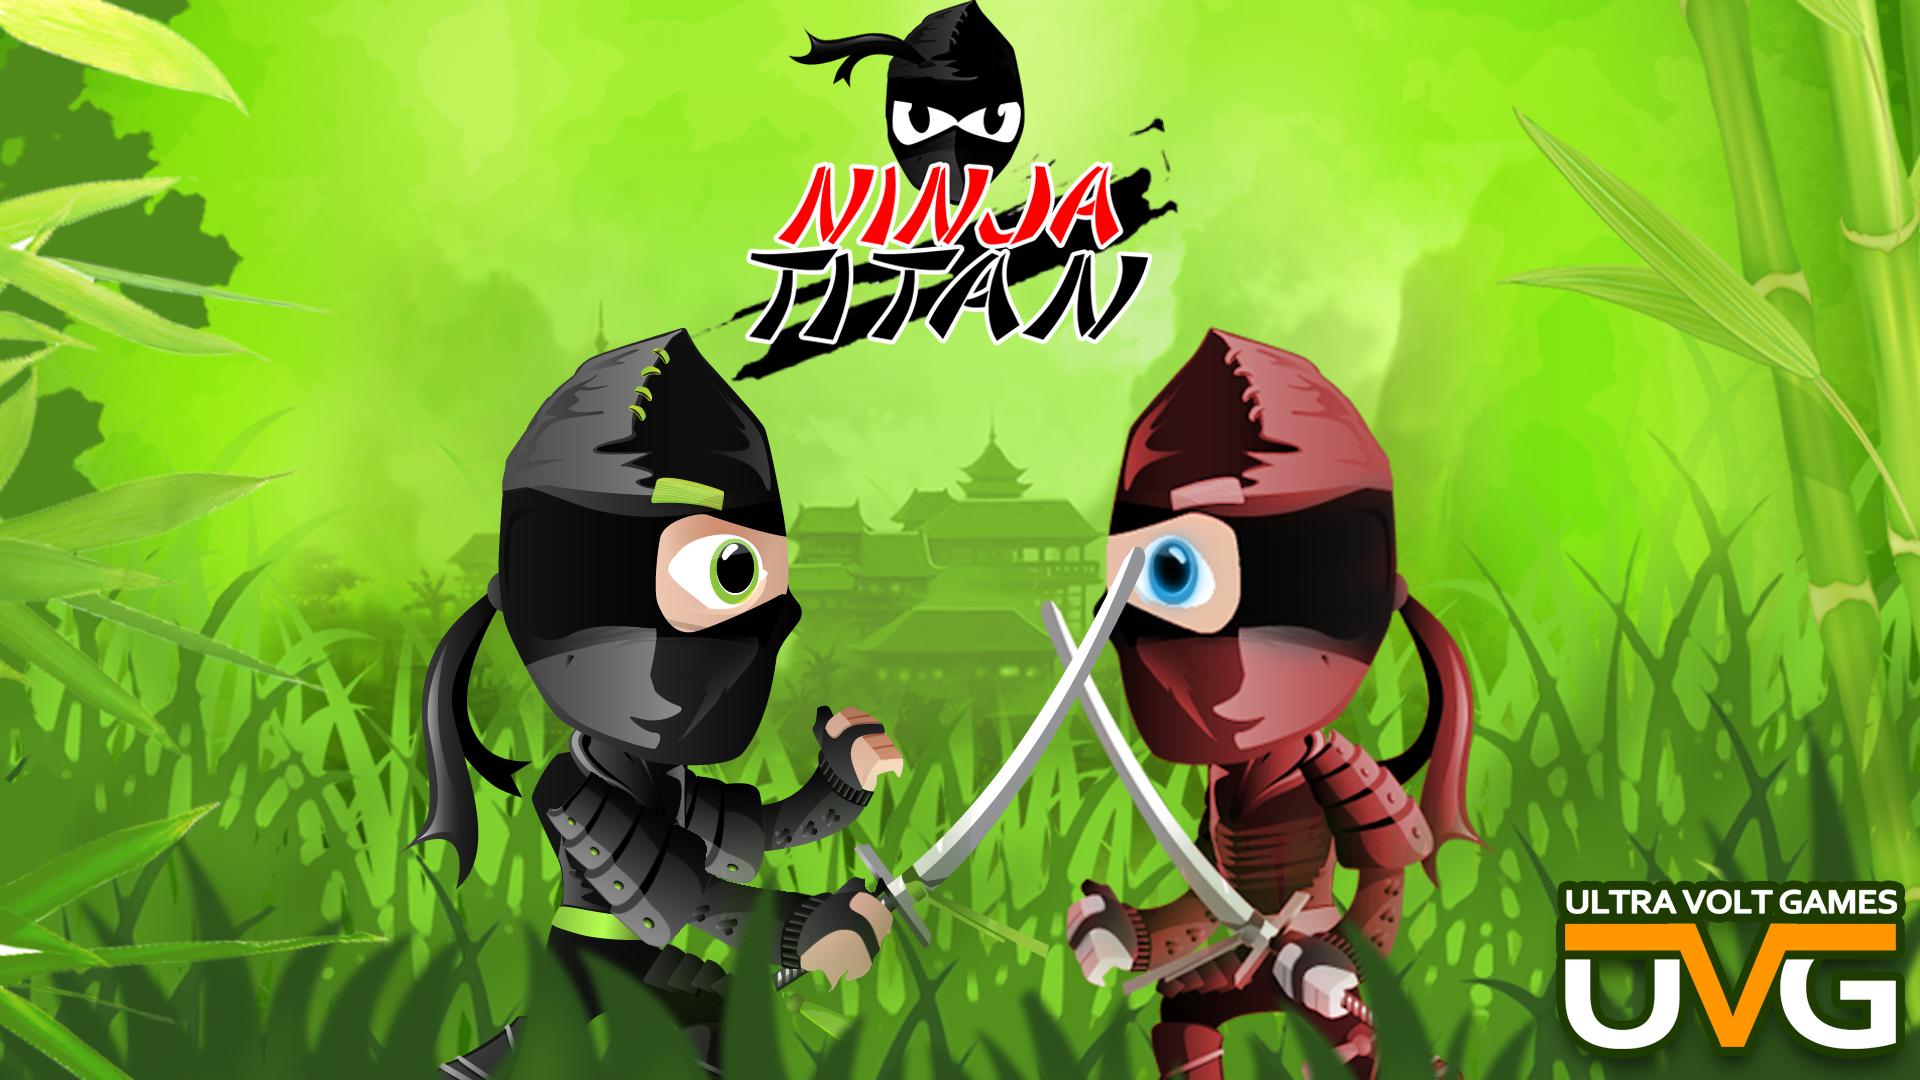 Ninja Titan-Ninja Shedow Fight